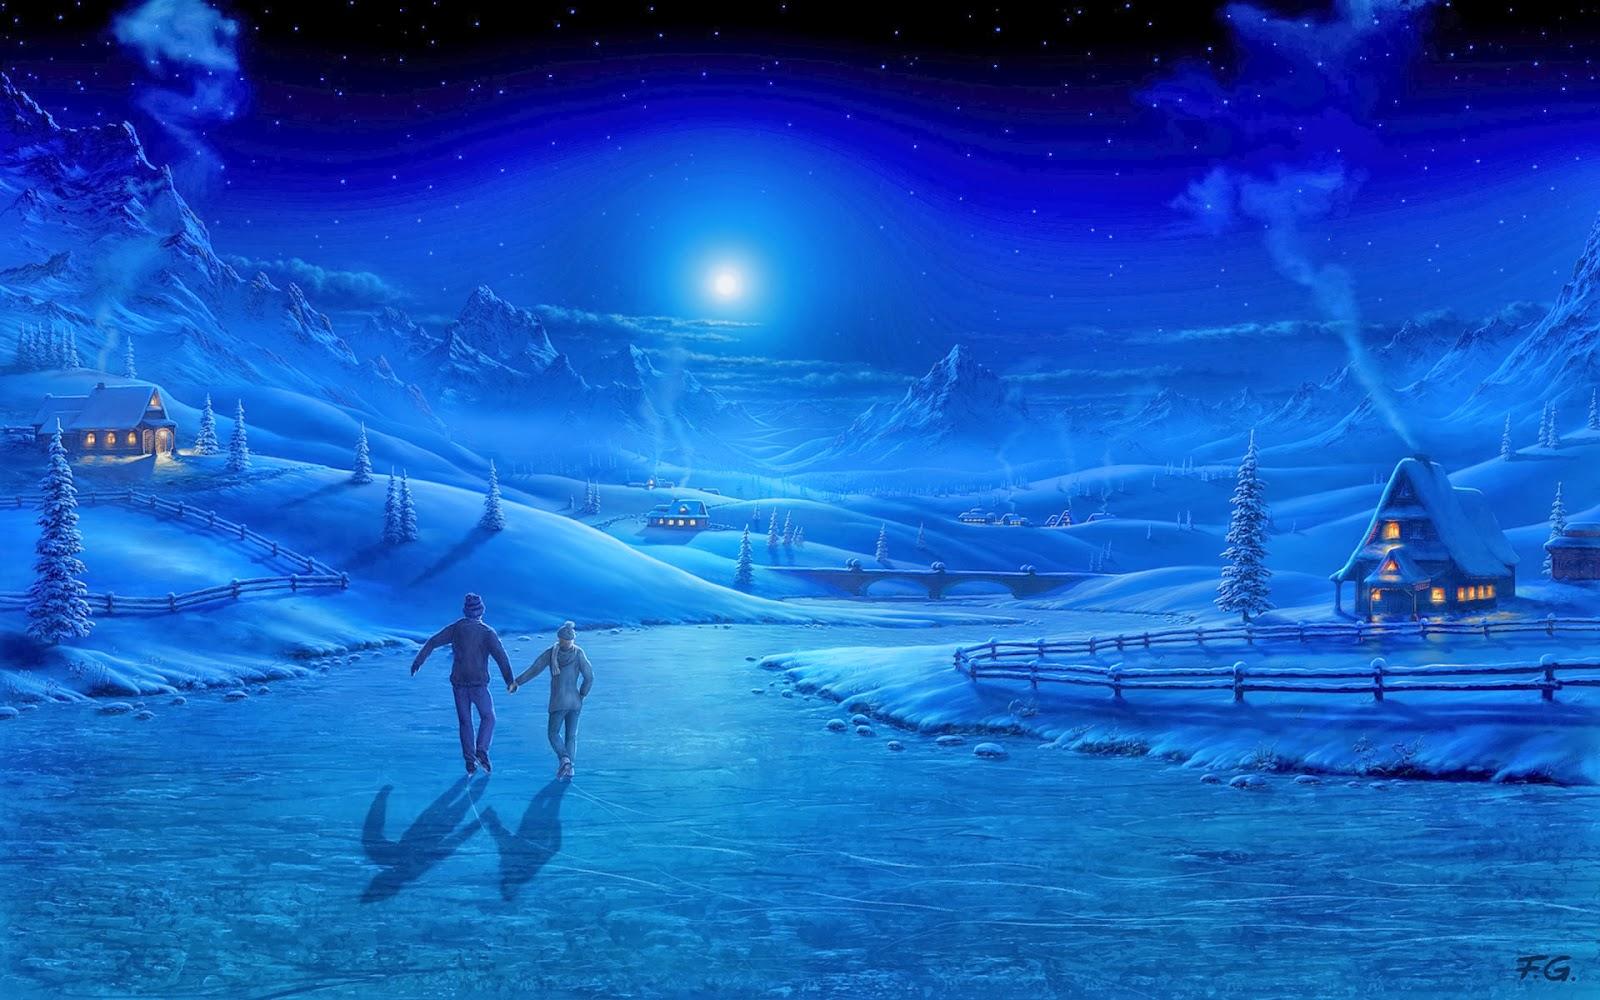 Lovers-walk-at-moon-light-Blue-image-HD.jpg